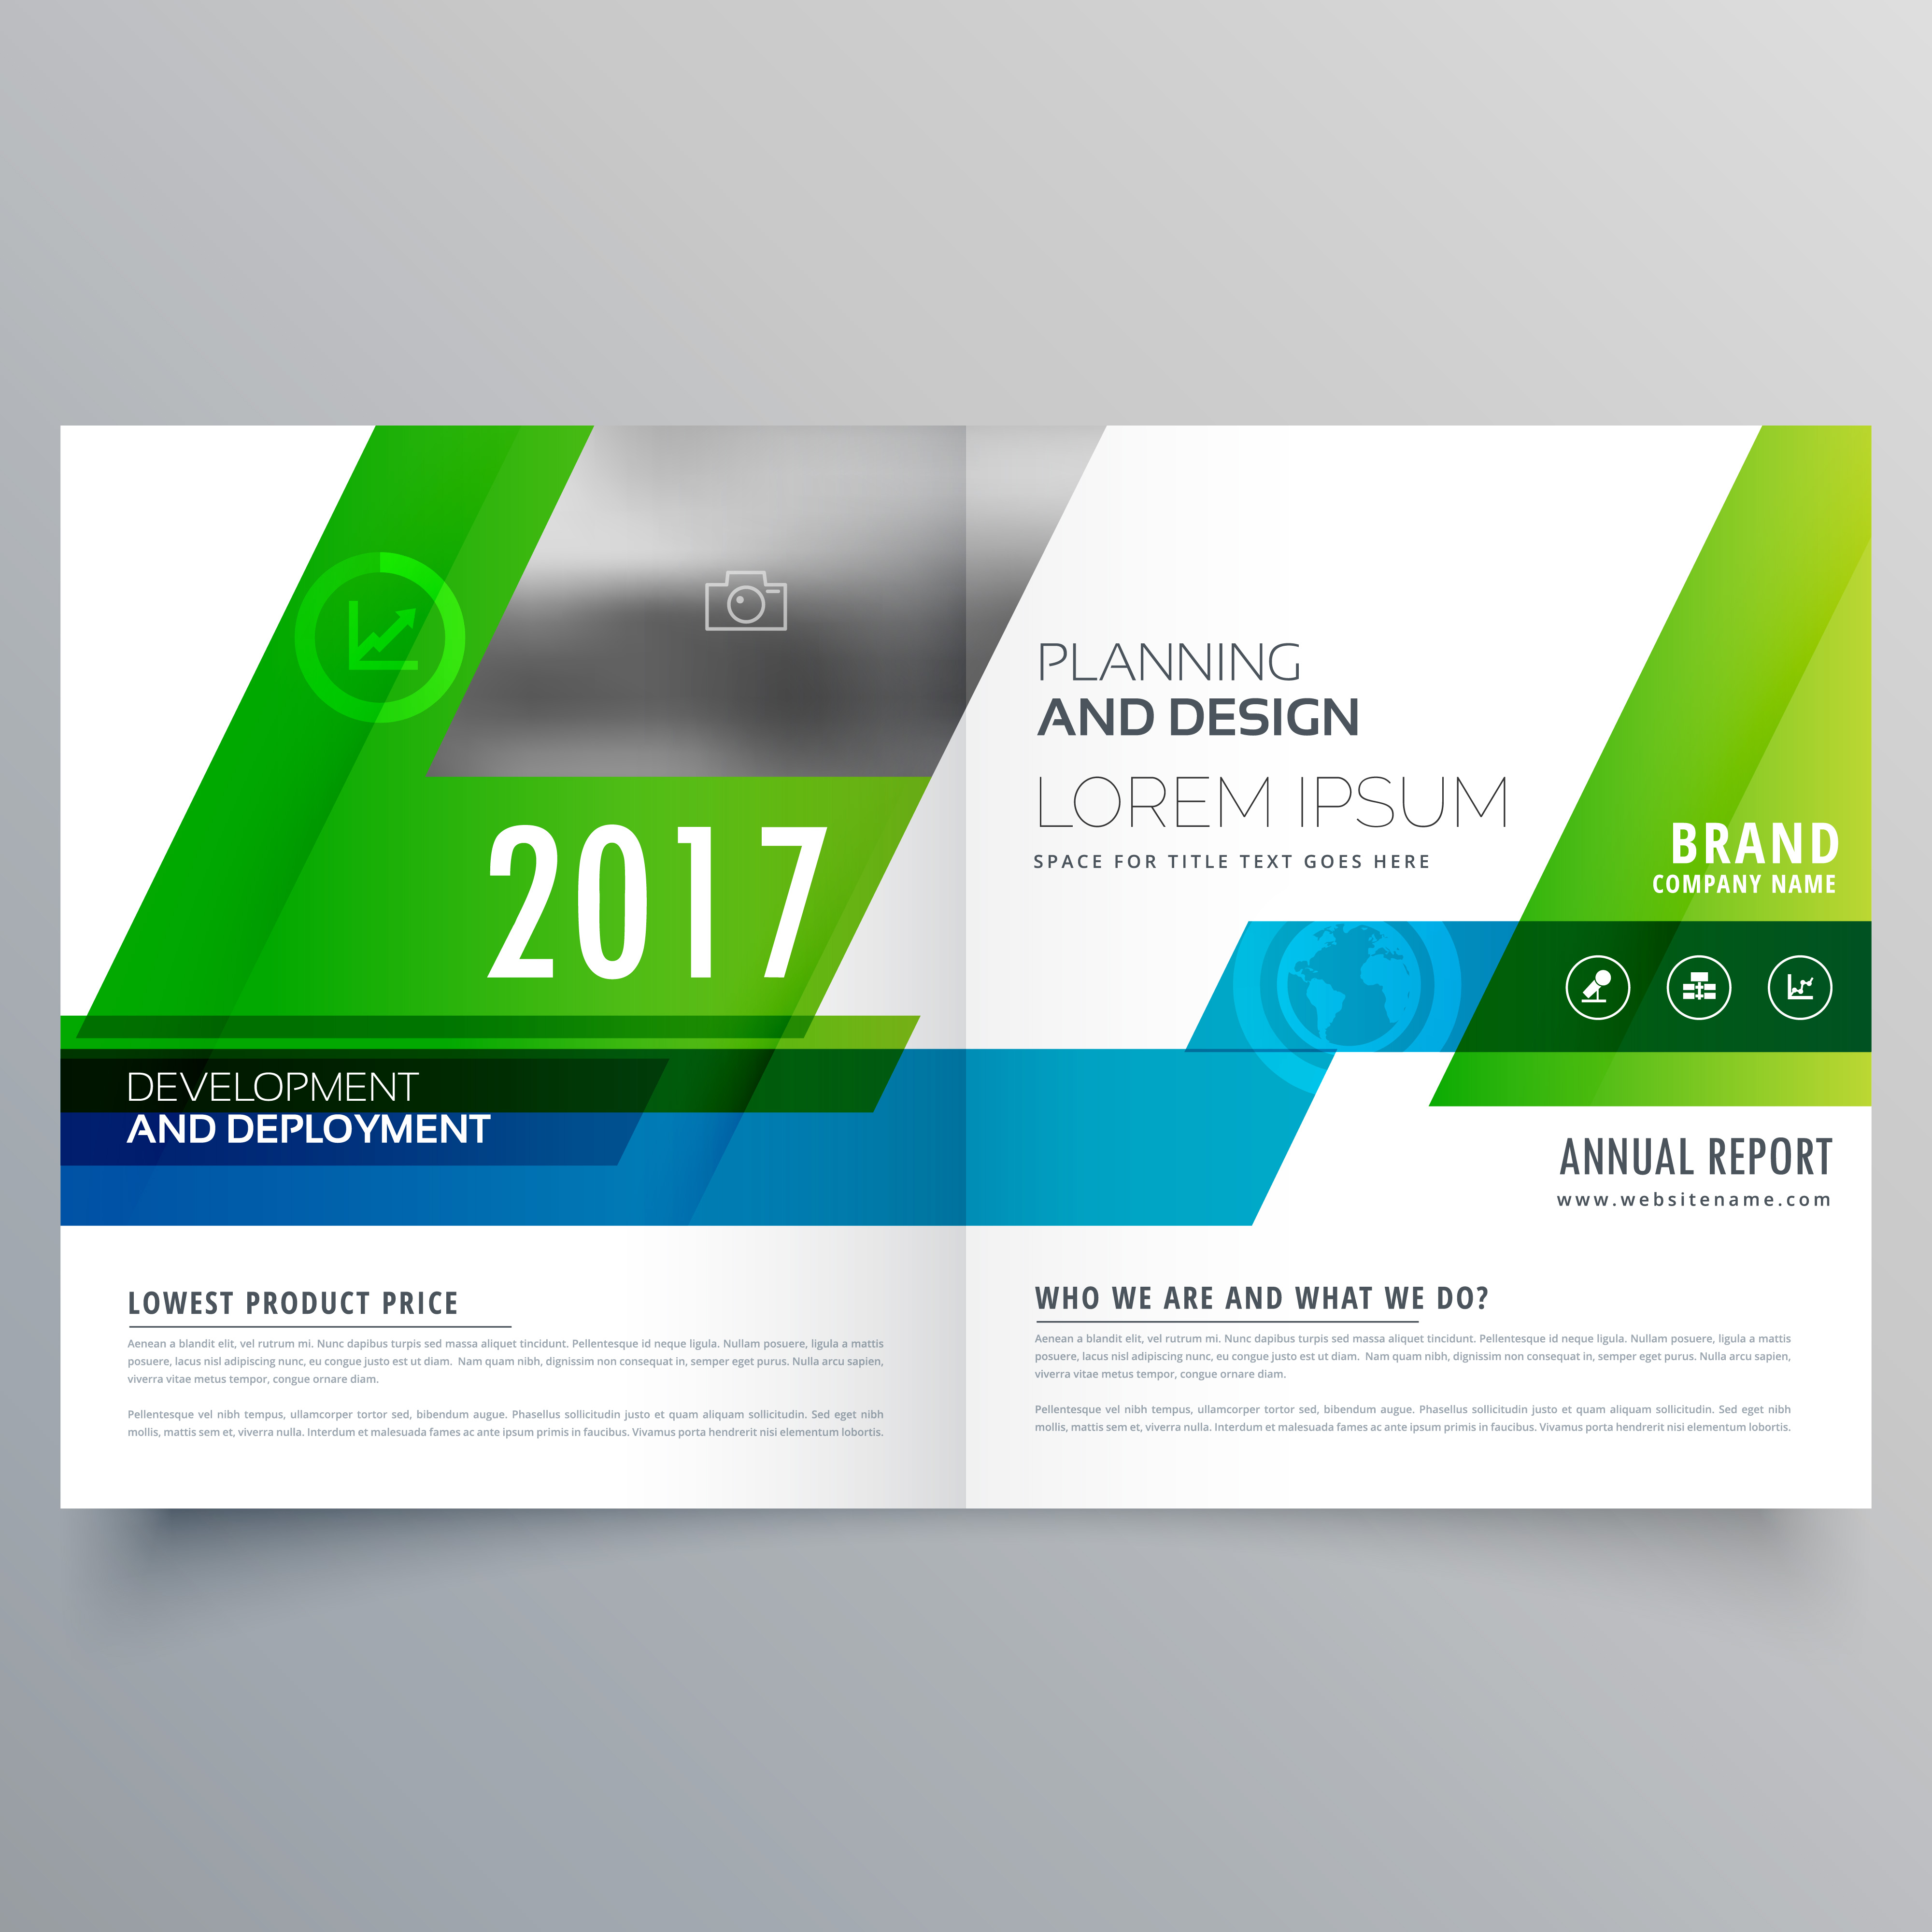 bi fold brochure templates free download - green bi fold brochure template design for your business